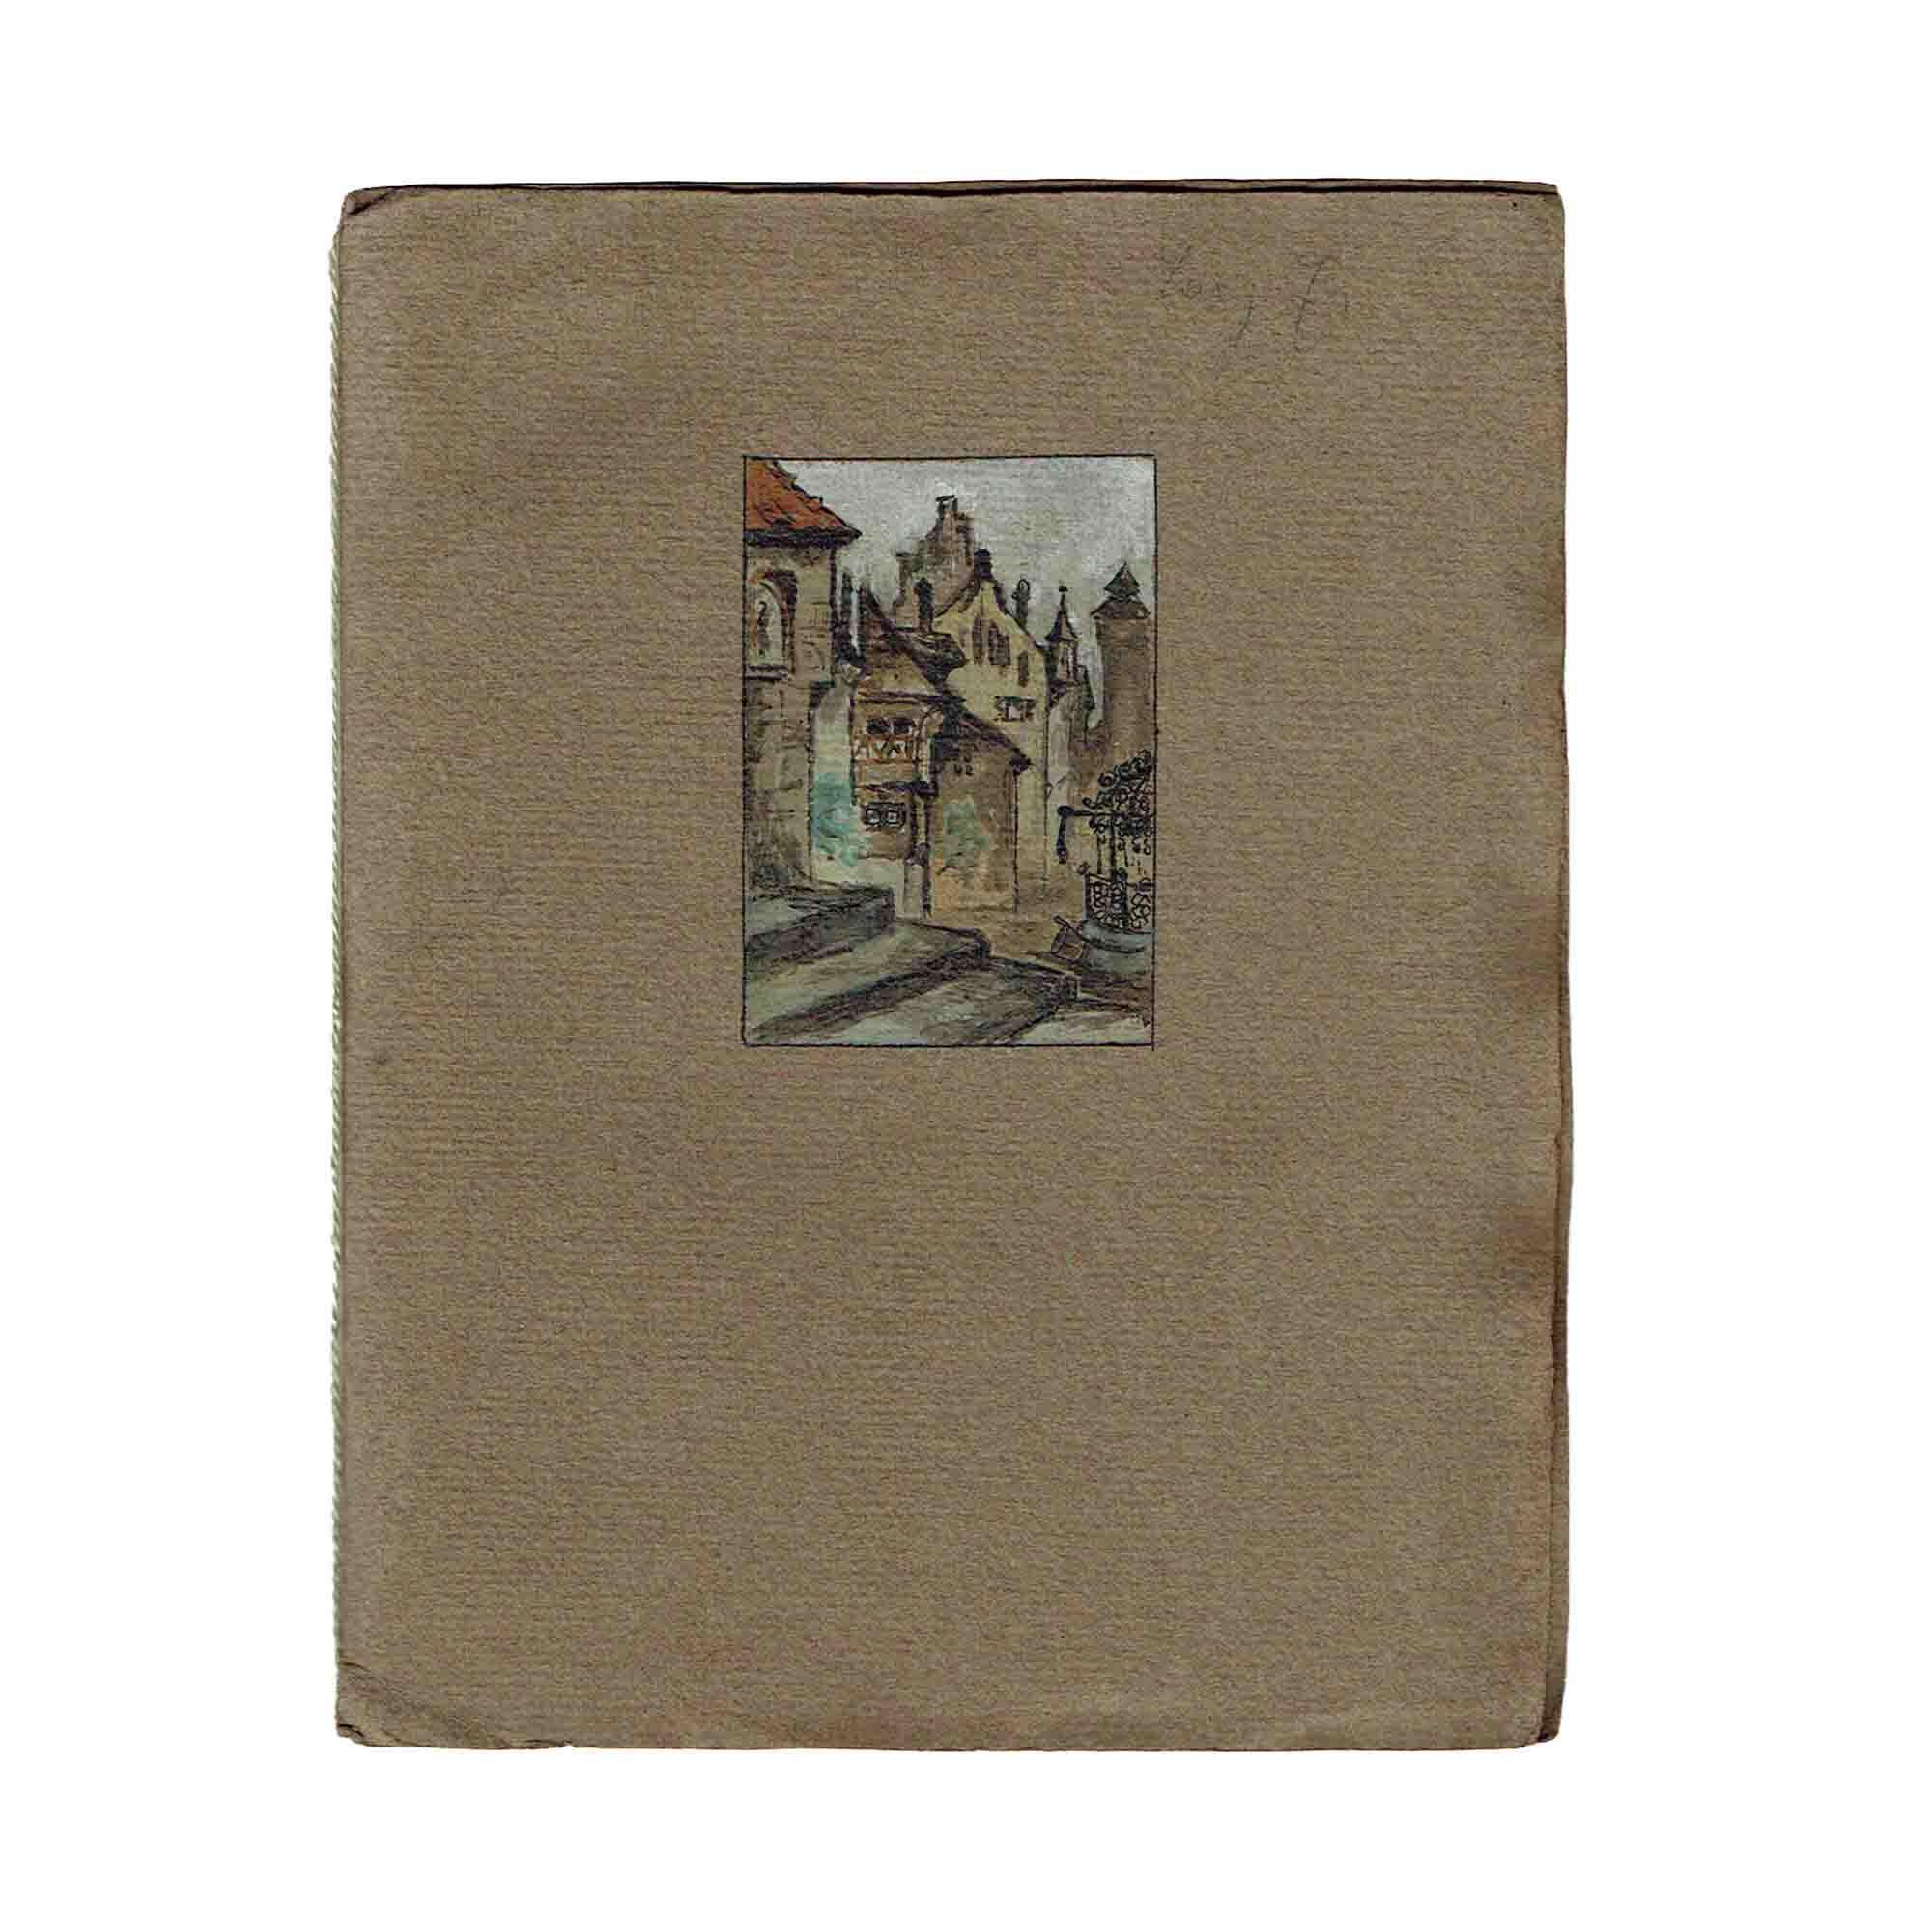 5293 Handschrift Lang Stadt Mittelalter 1917 Umschlag frei N